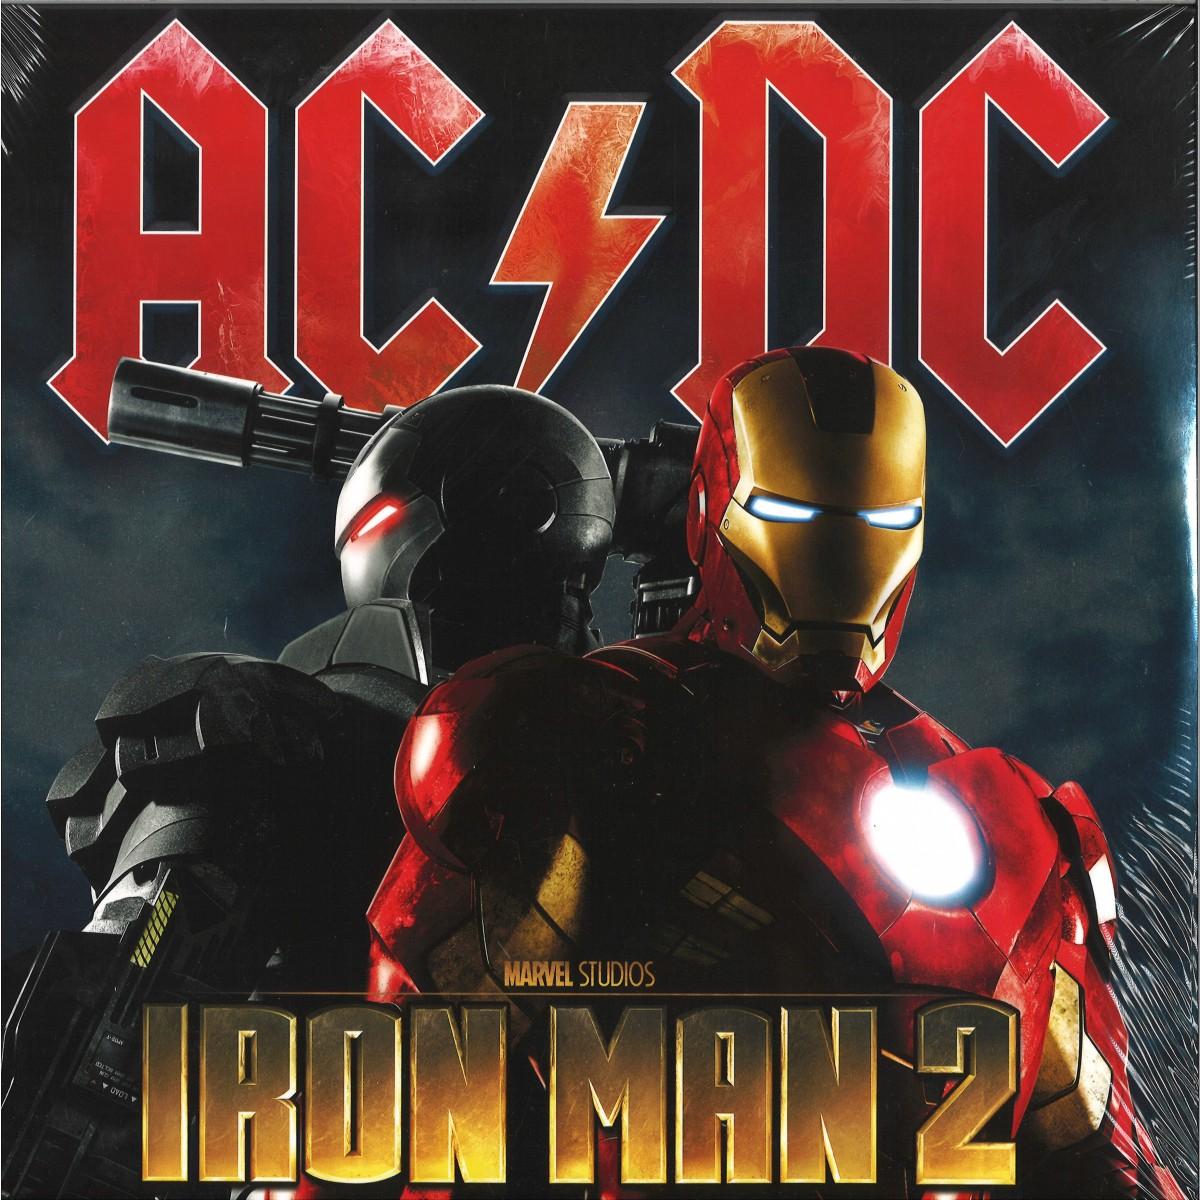 Ac/dc - Iron Man 2 / Sony Music Entertainment 88697661581 - Vinyl